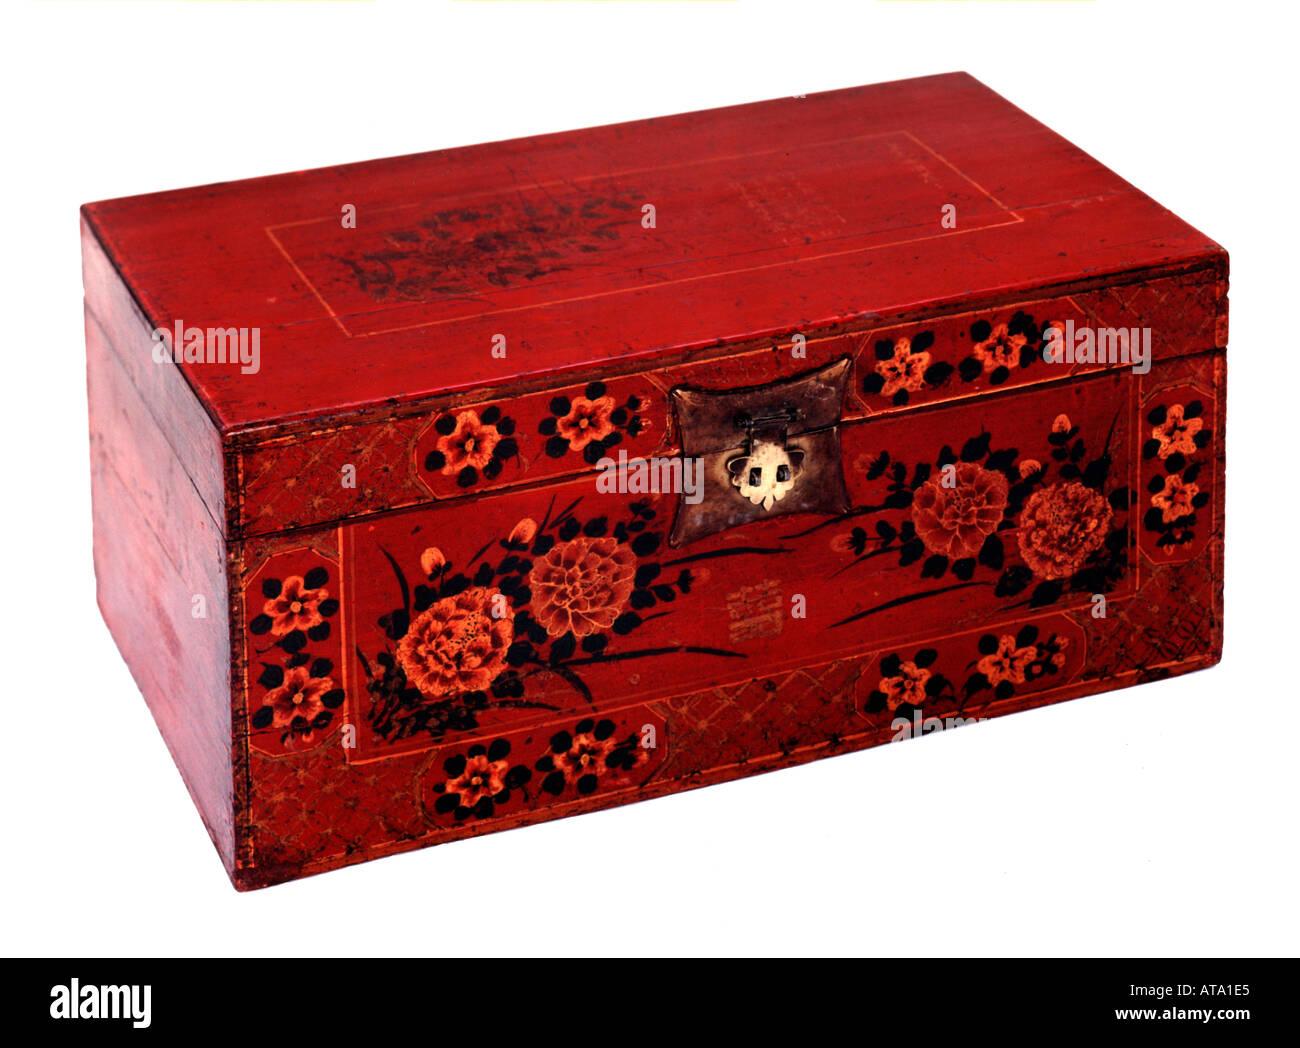 Etonnant Chinese Antique Painted Storage Box